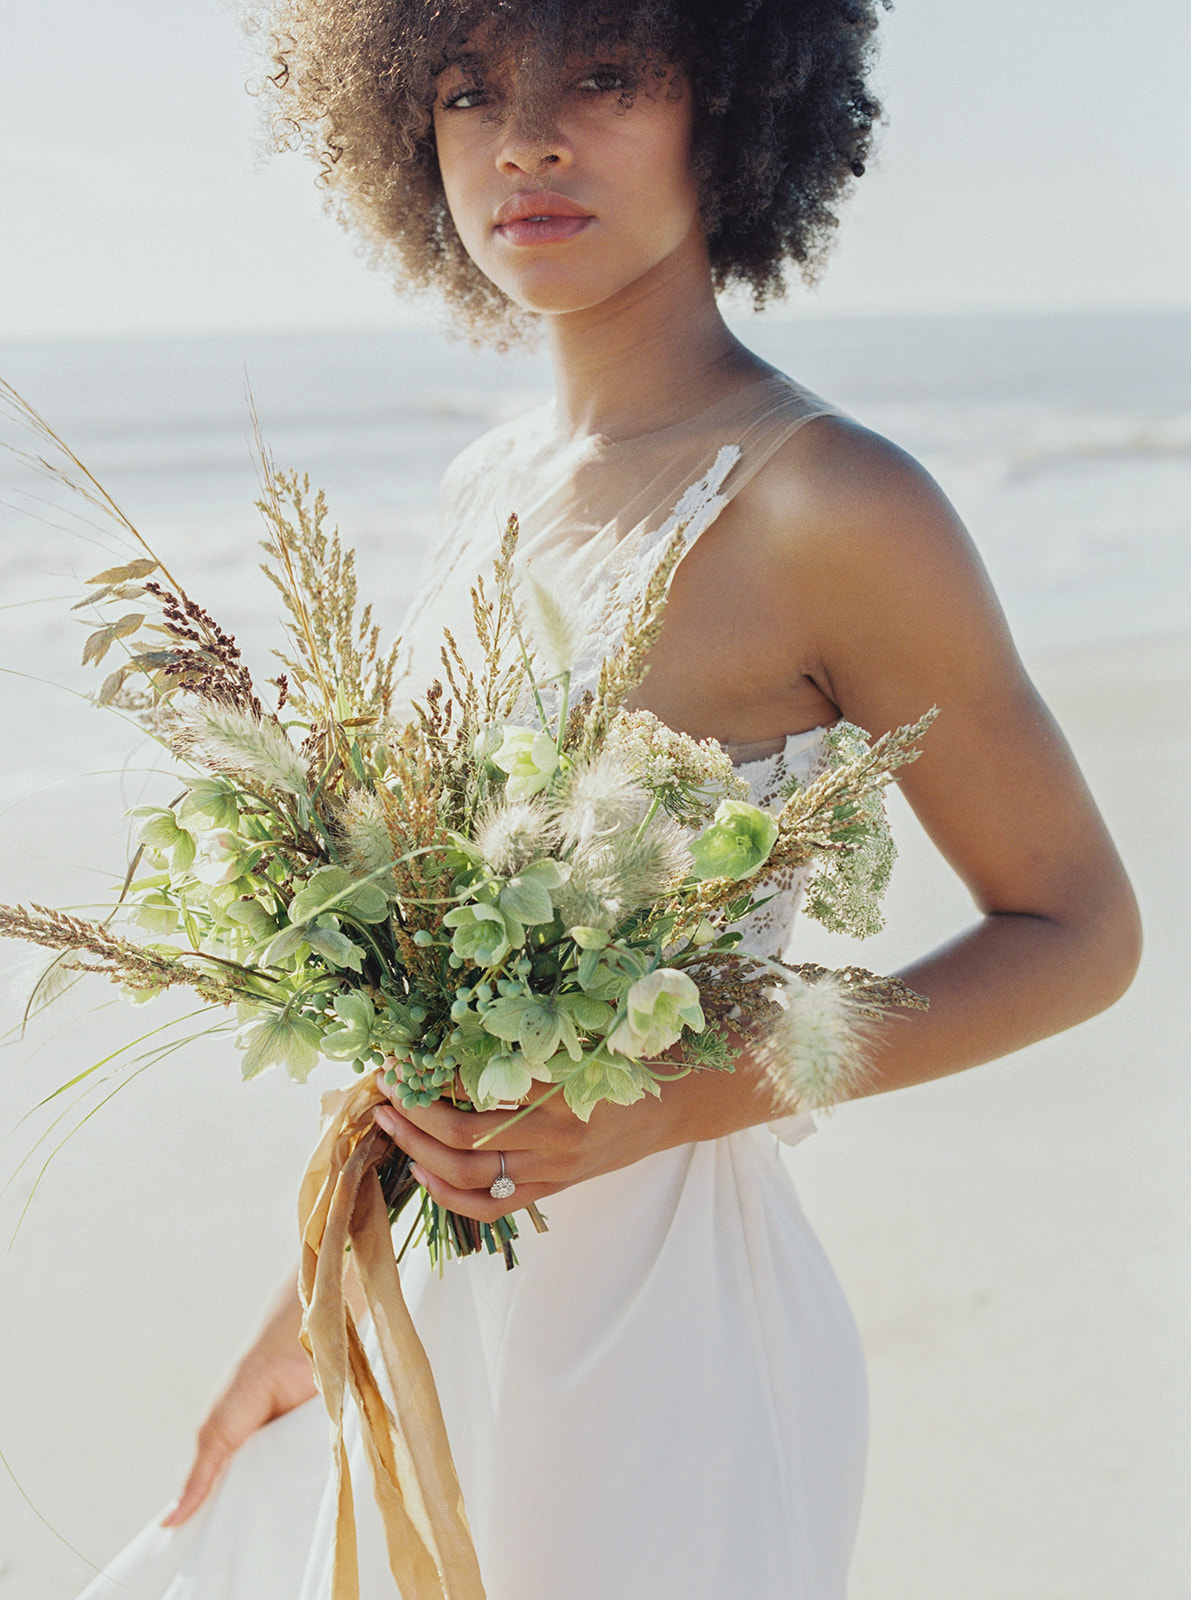 hannah-michelle-photography-atlanta-wedding-photographer-1.jpg